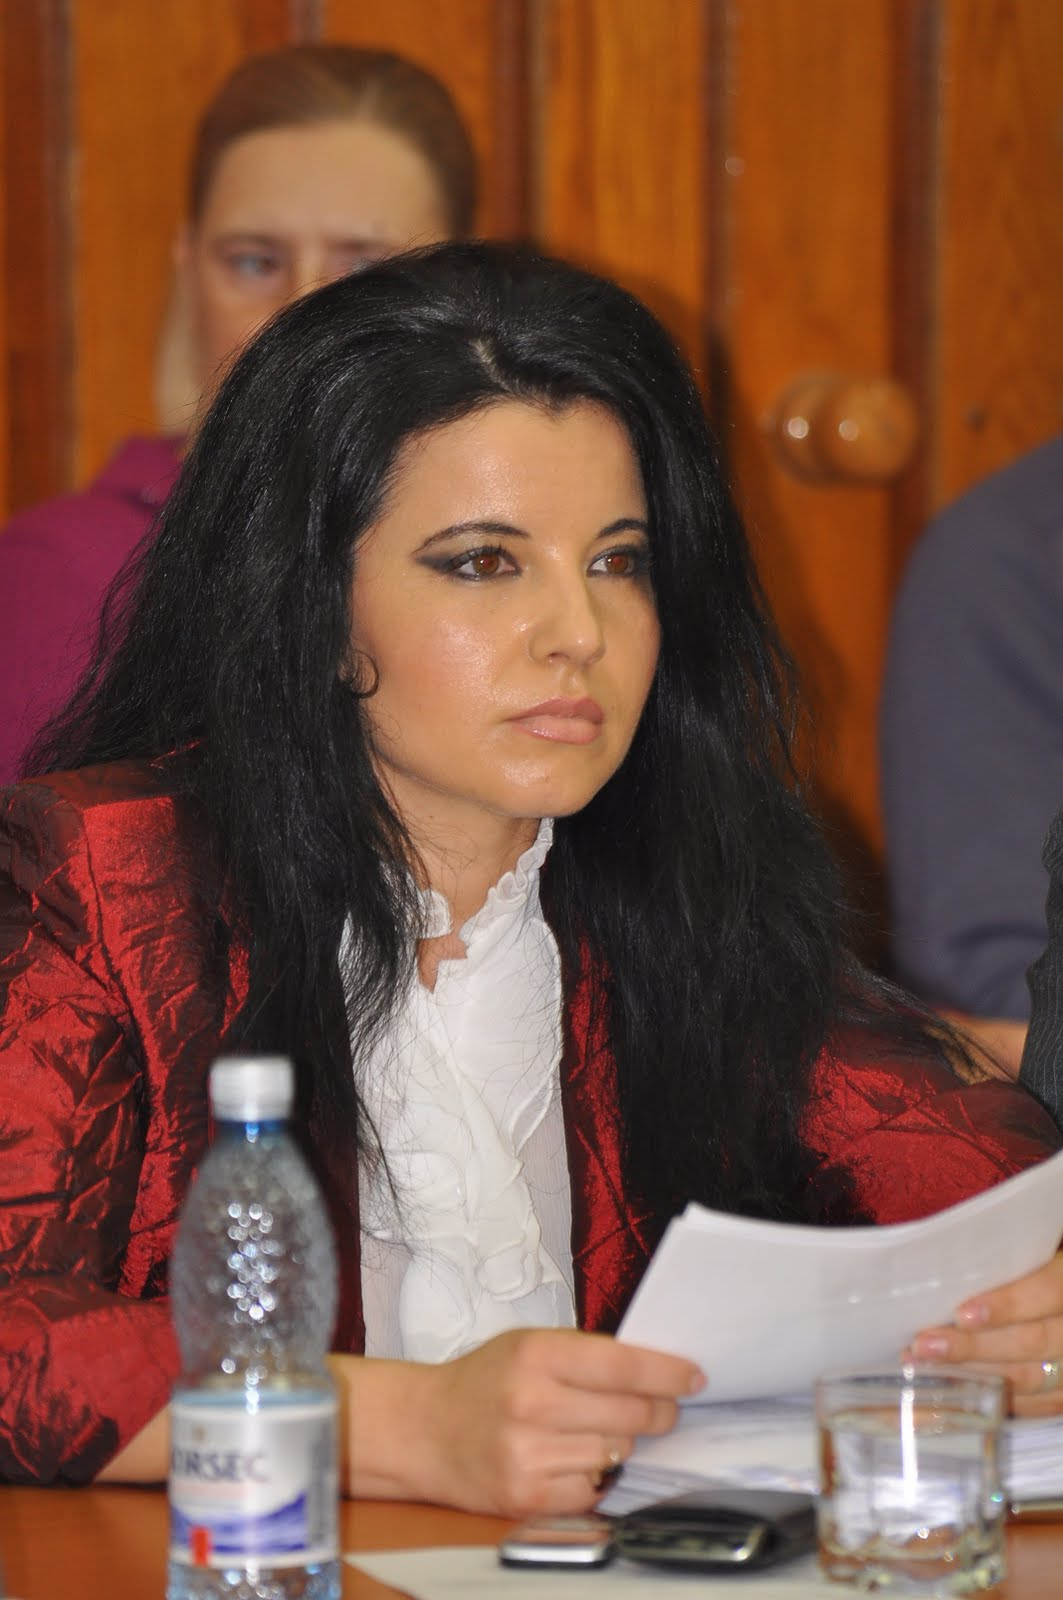 Veronica_Nicolae1